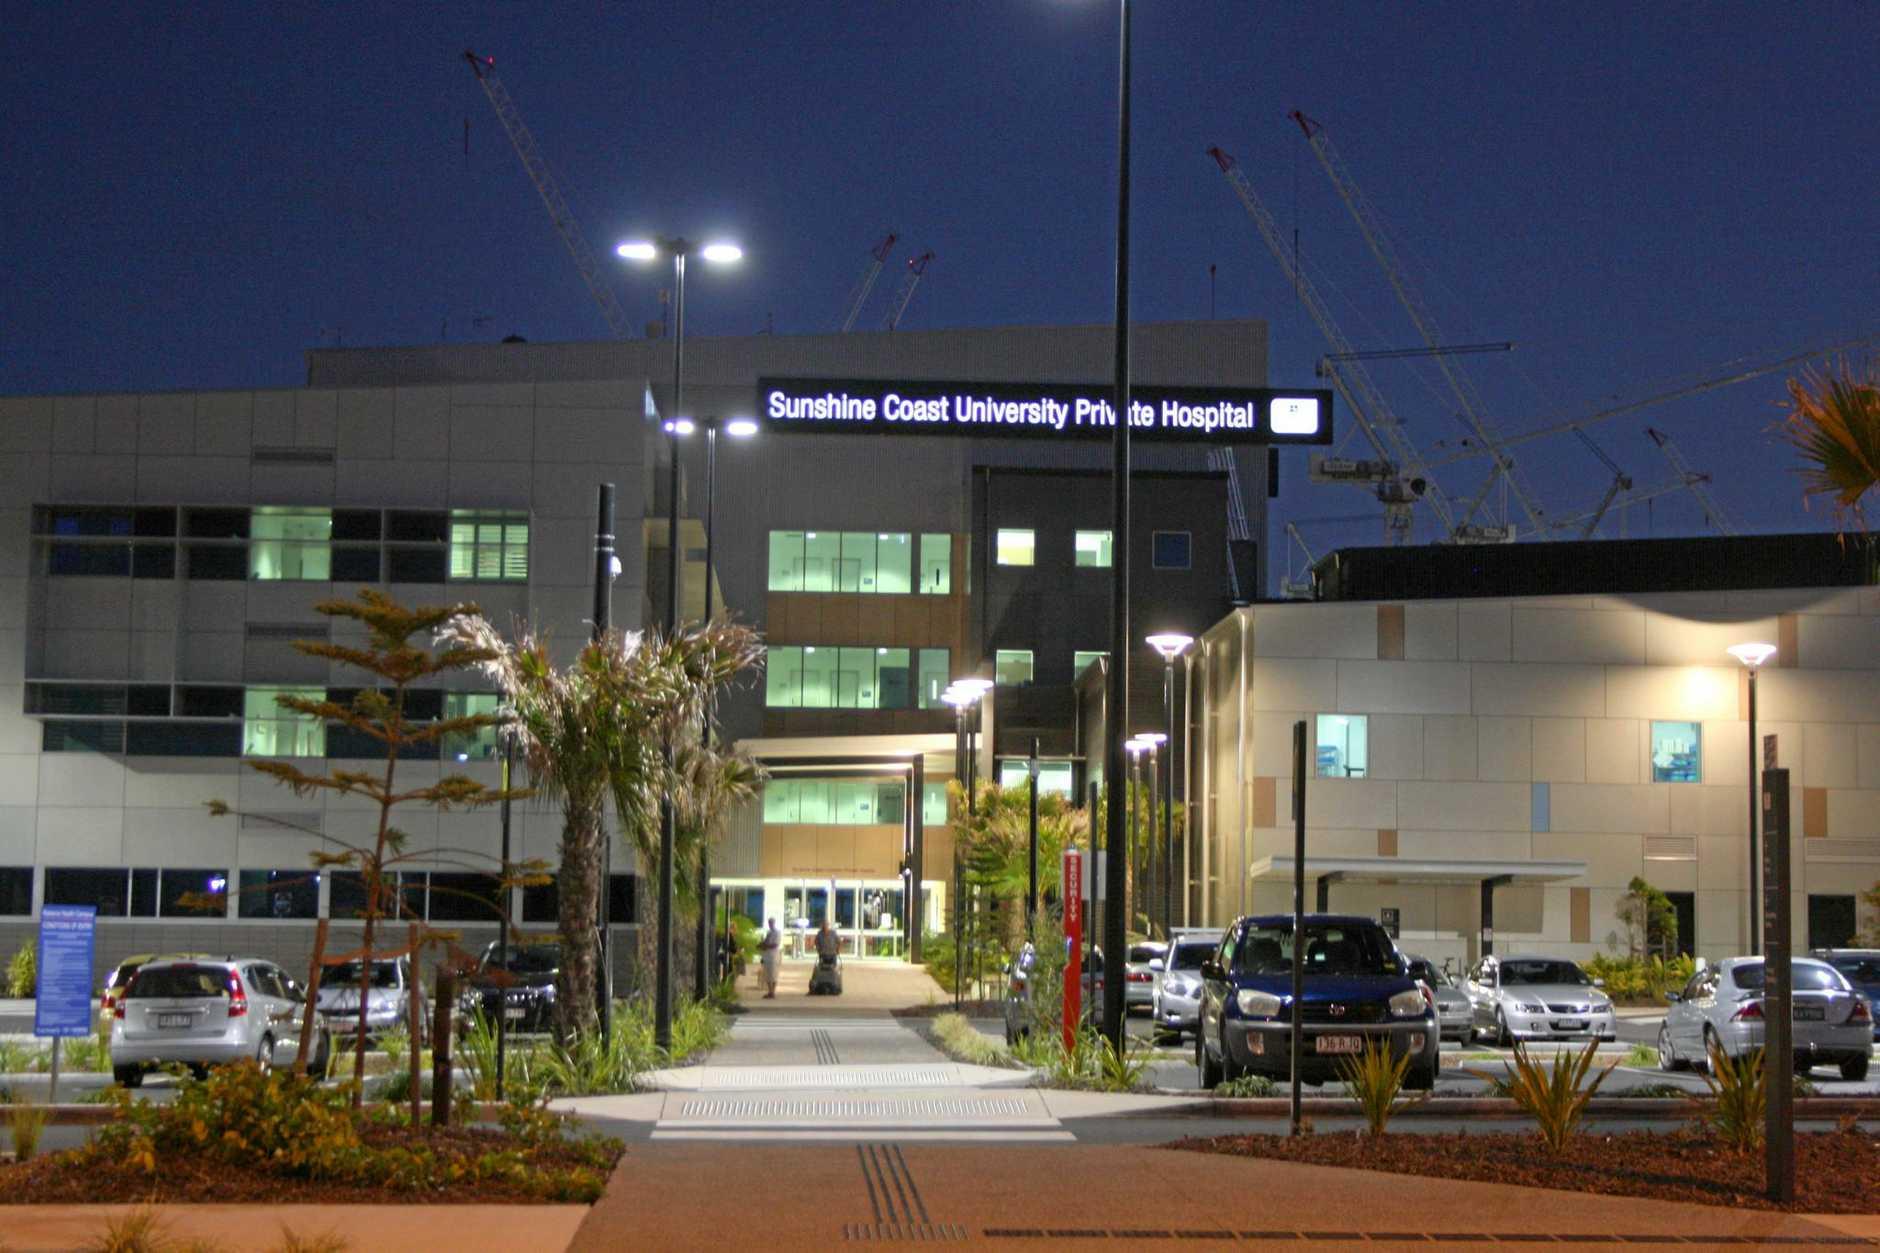 The new Sunshine Coast University Private Hospital.